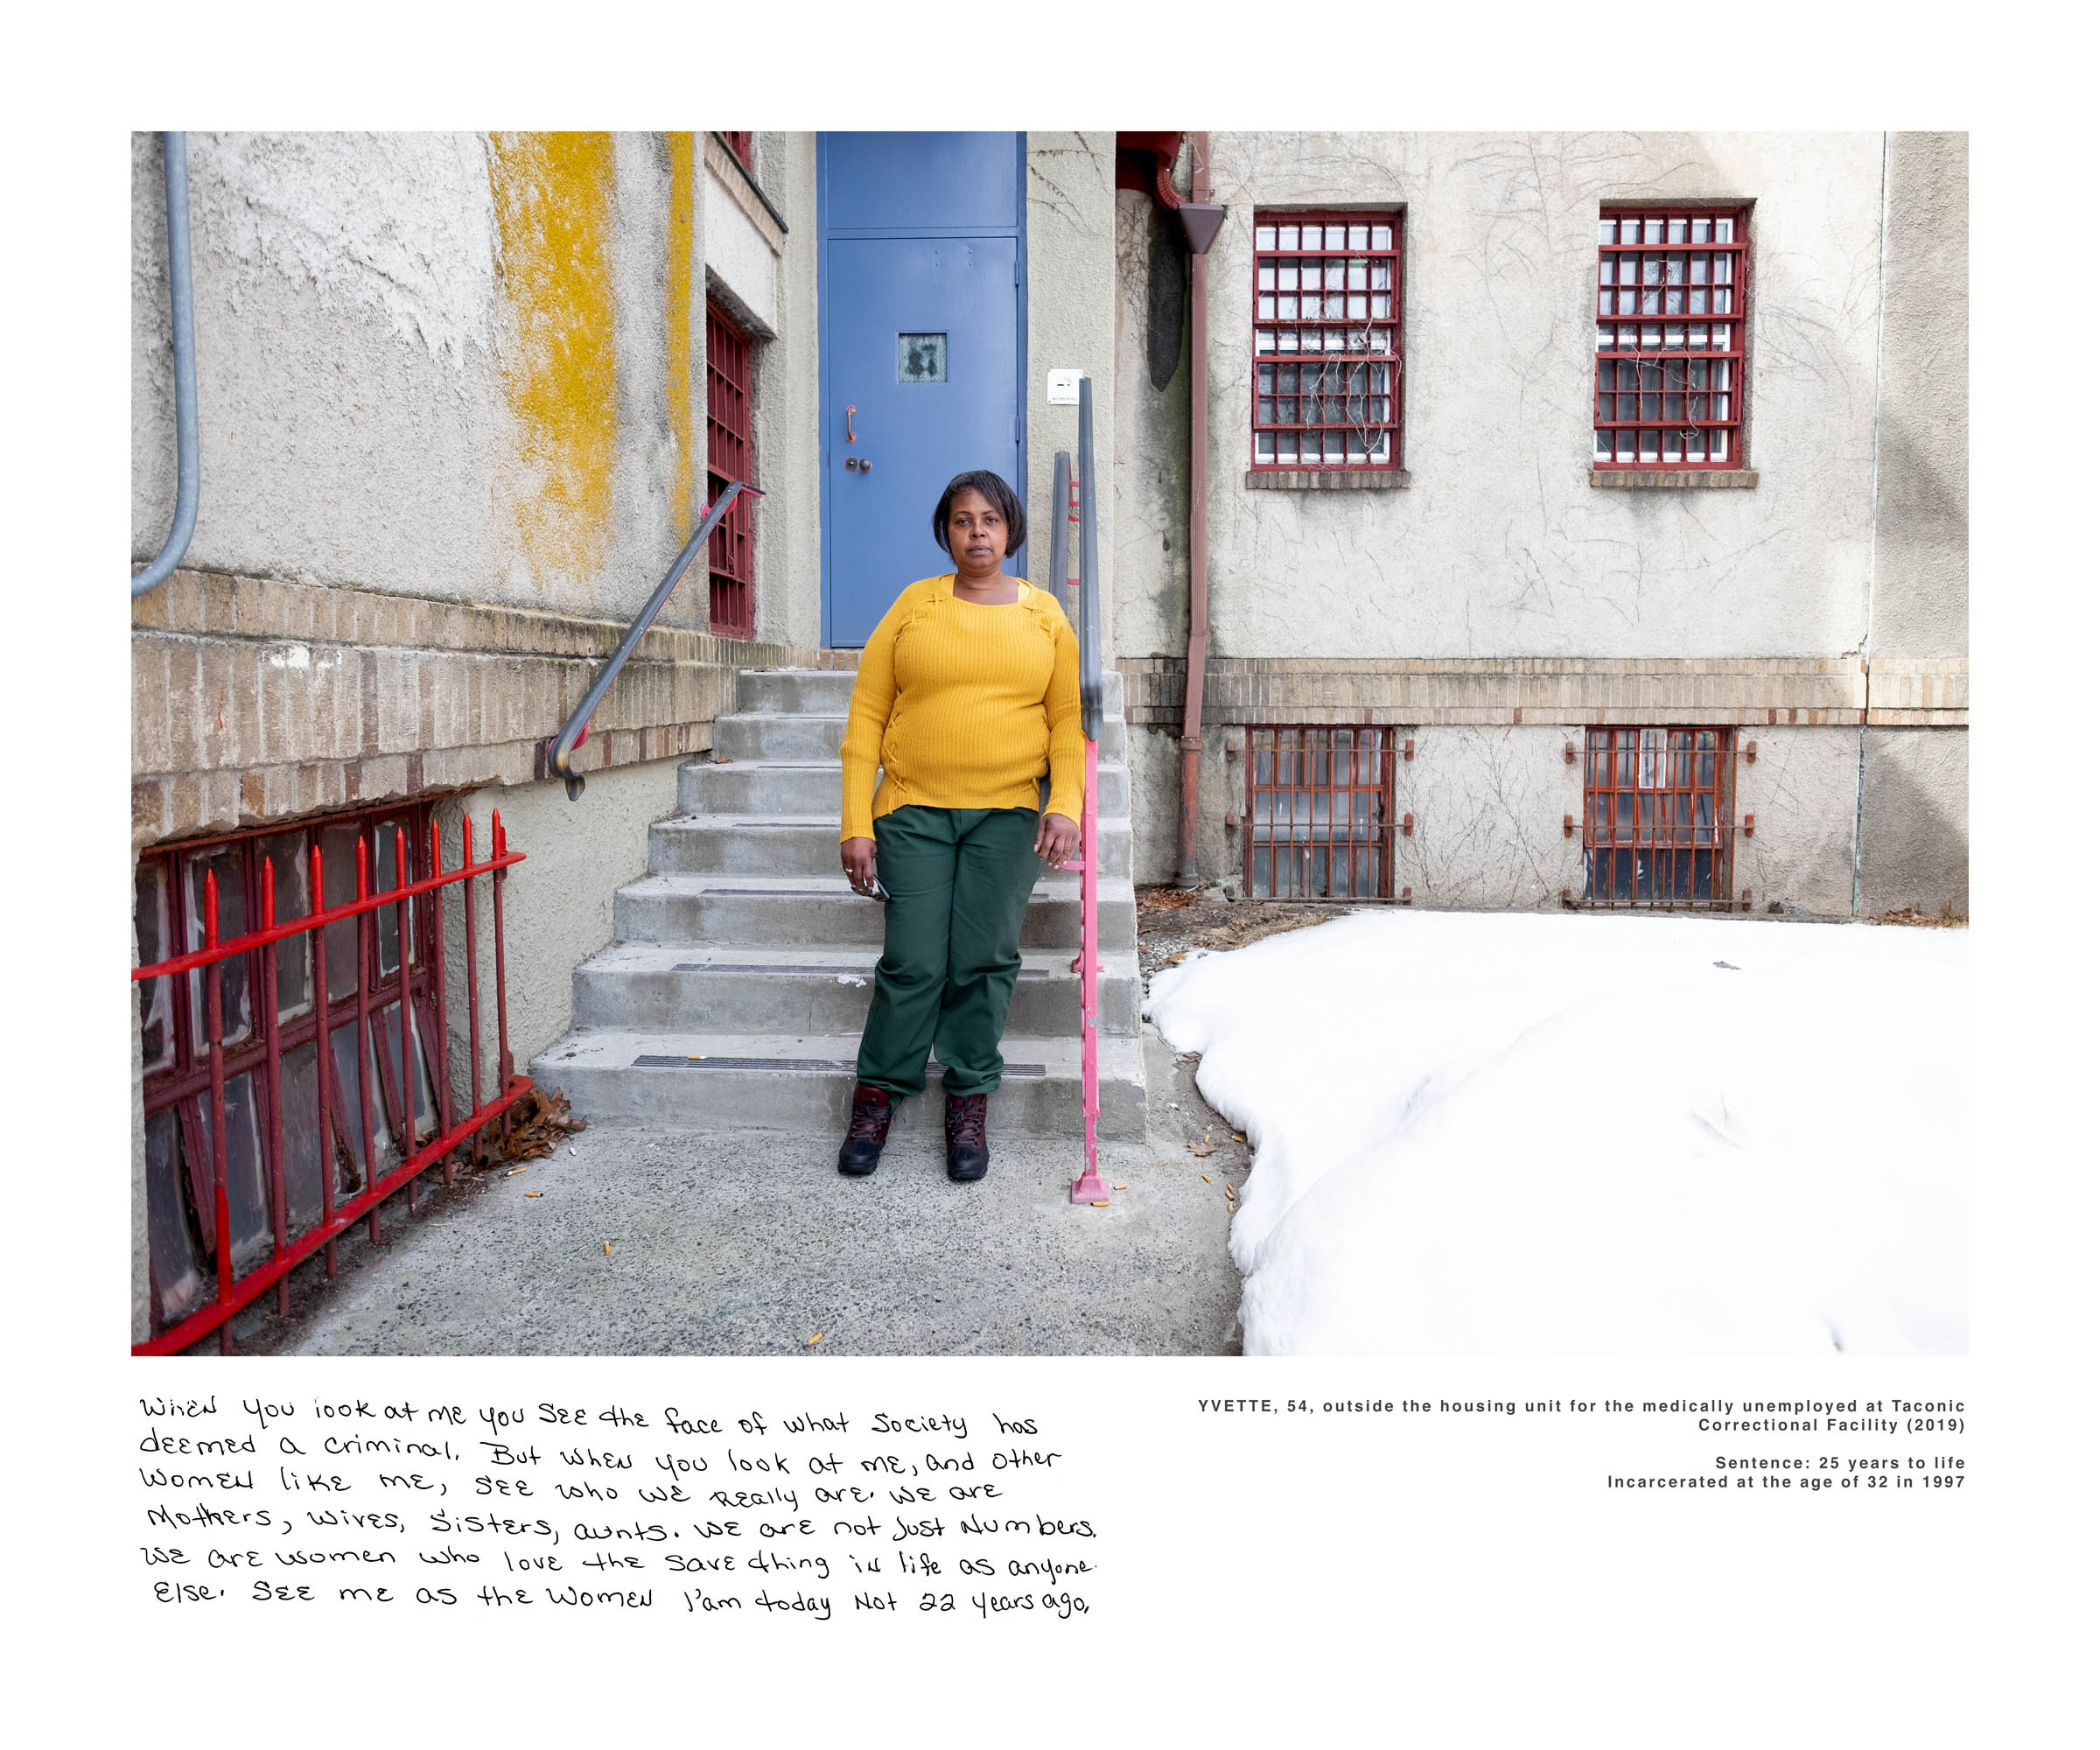 Yvette 20x24 print.jpg